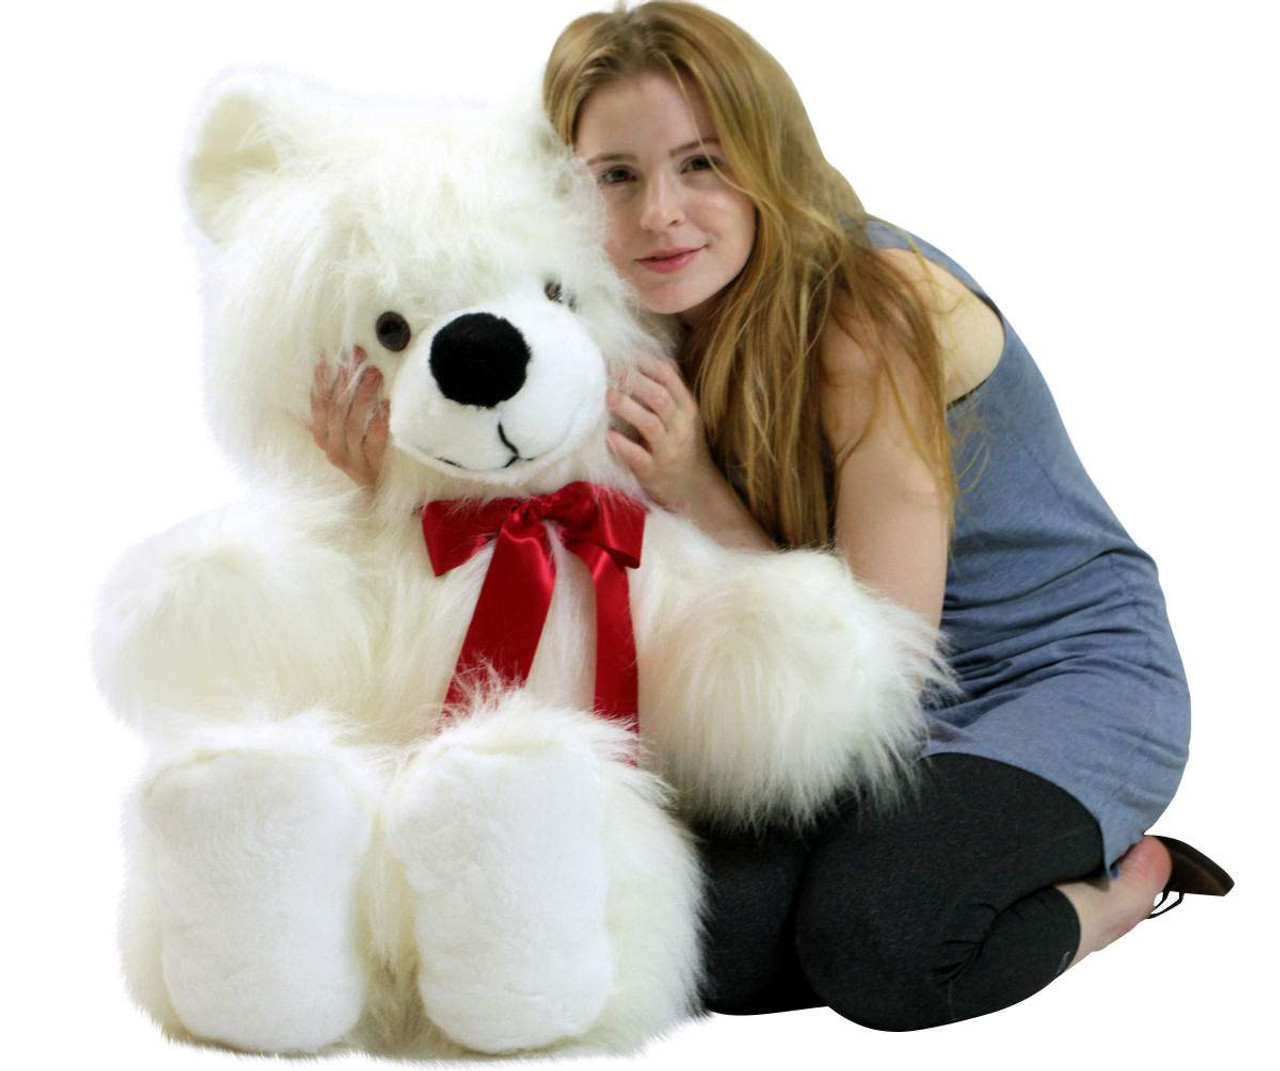 American Made Giant White Teddy Bear 46 Inch Soft Big Plush